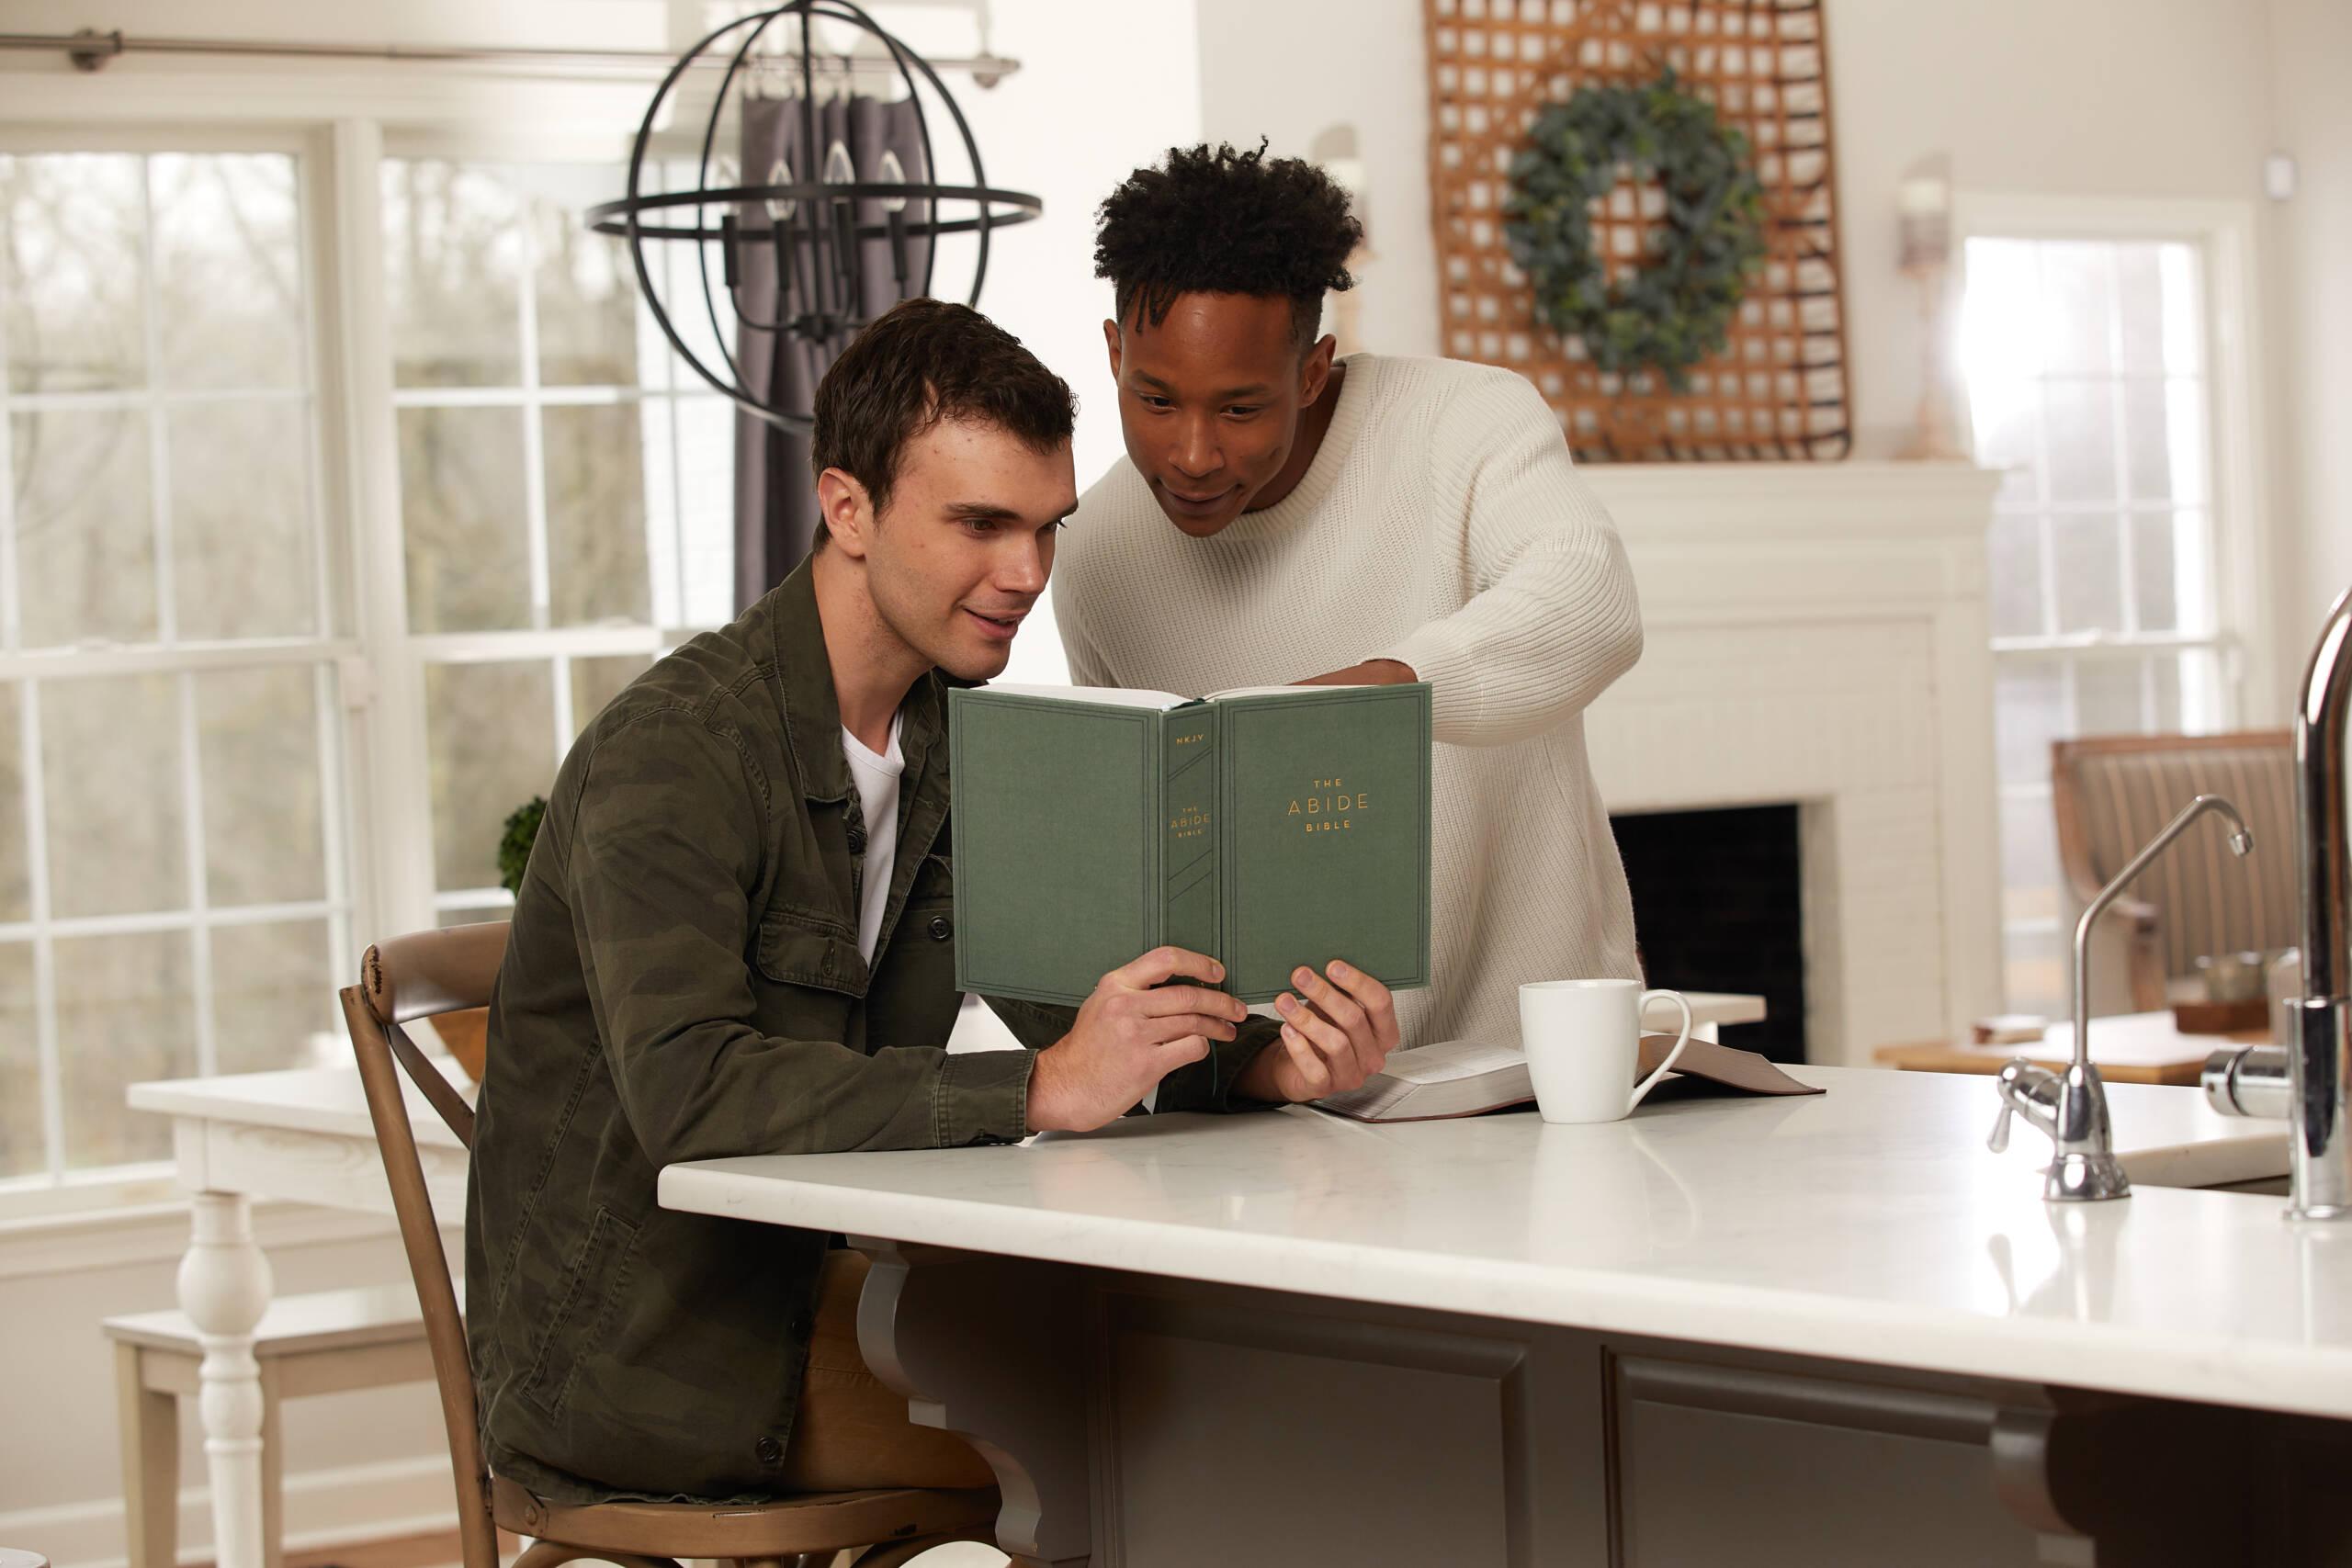 two friends reading abide bible 21 days in john invite a friend